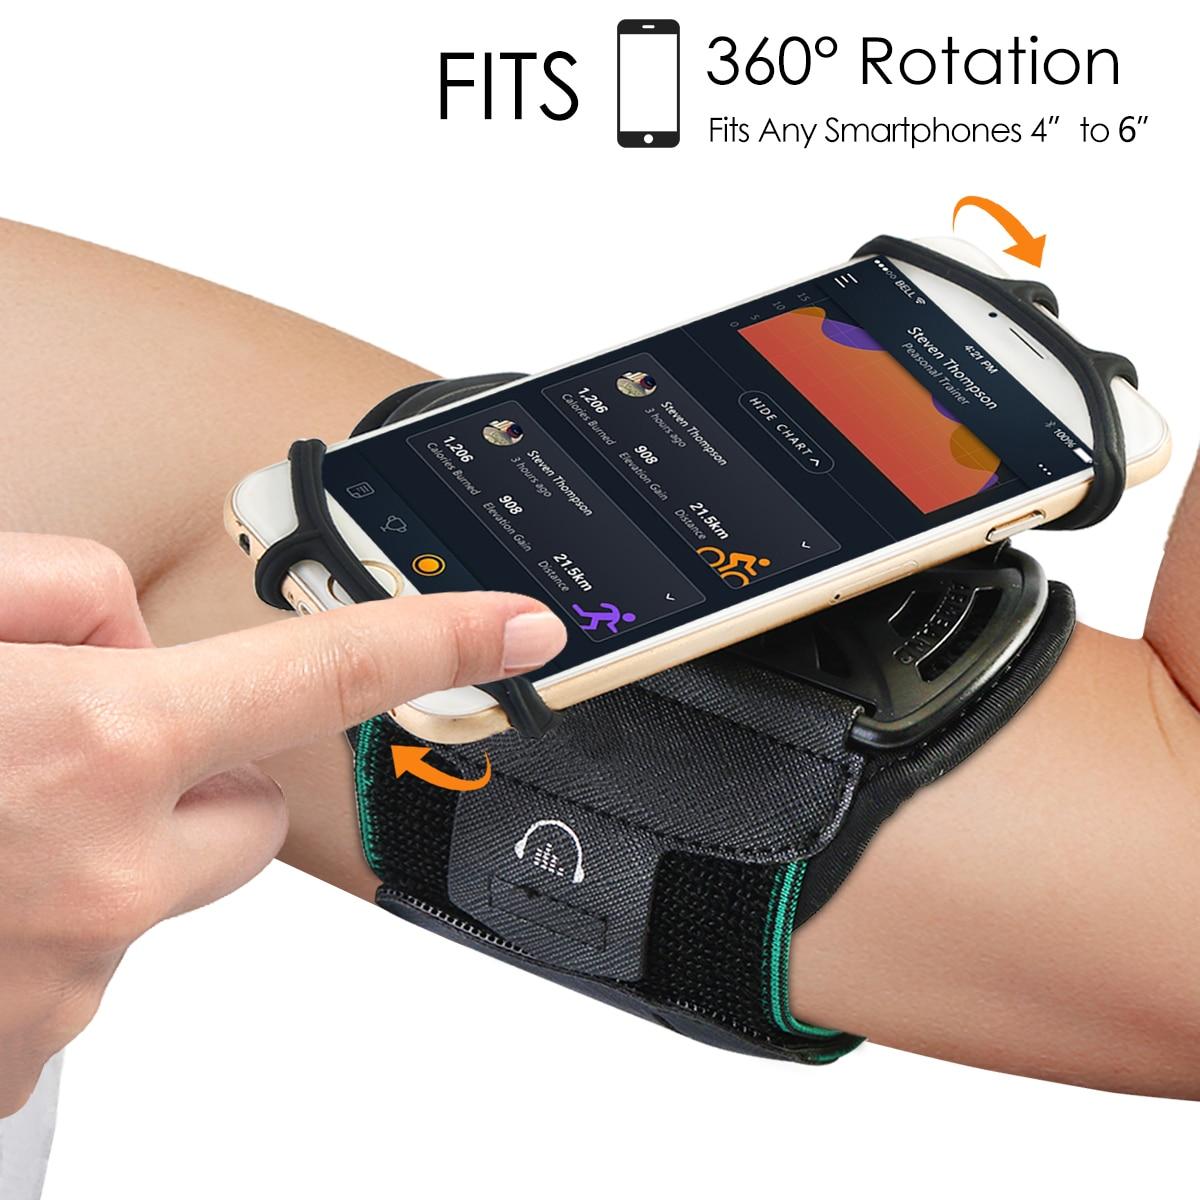 FLEX360 Sports Phone Wristband